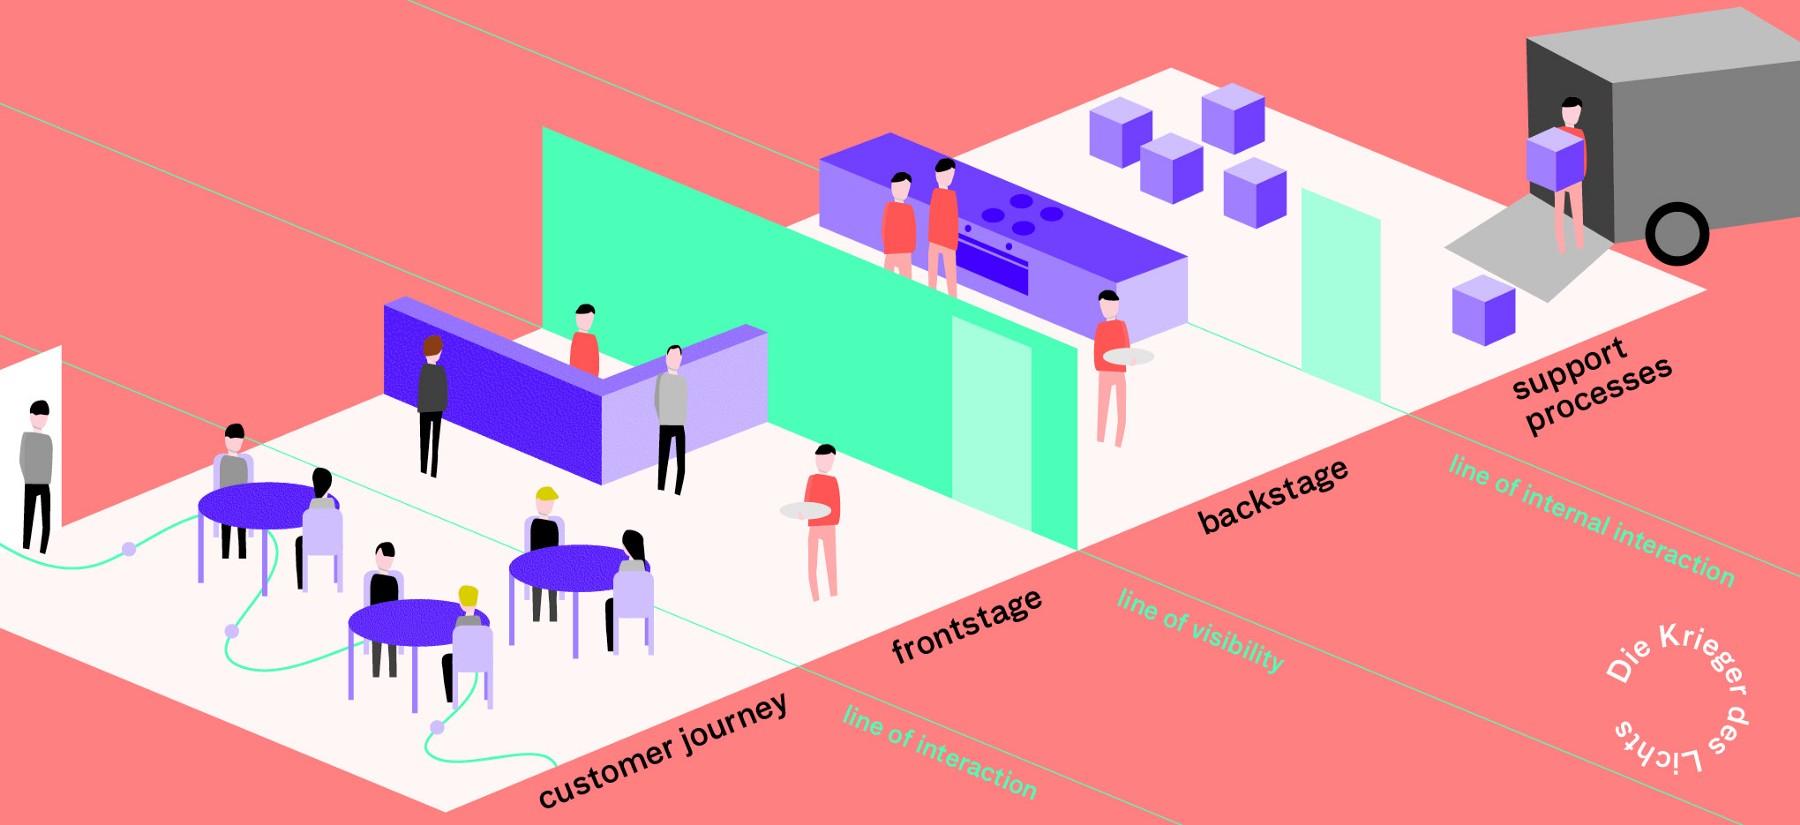 Agile Service Design Thinking - CX Front